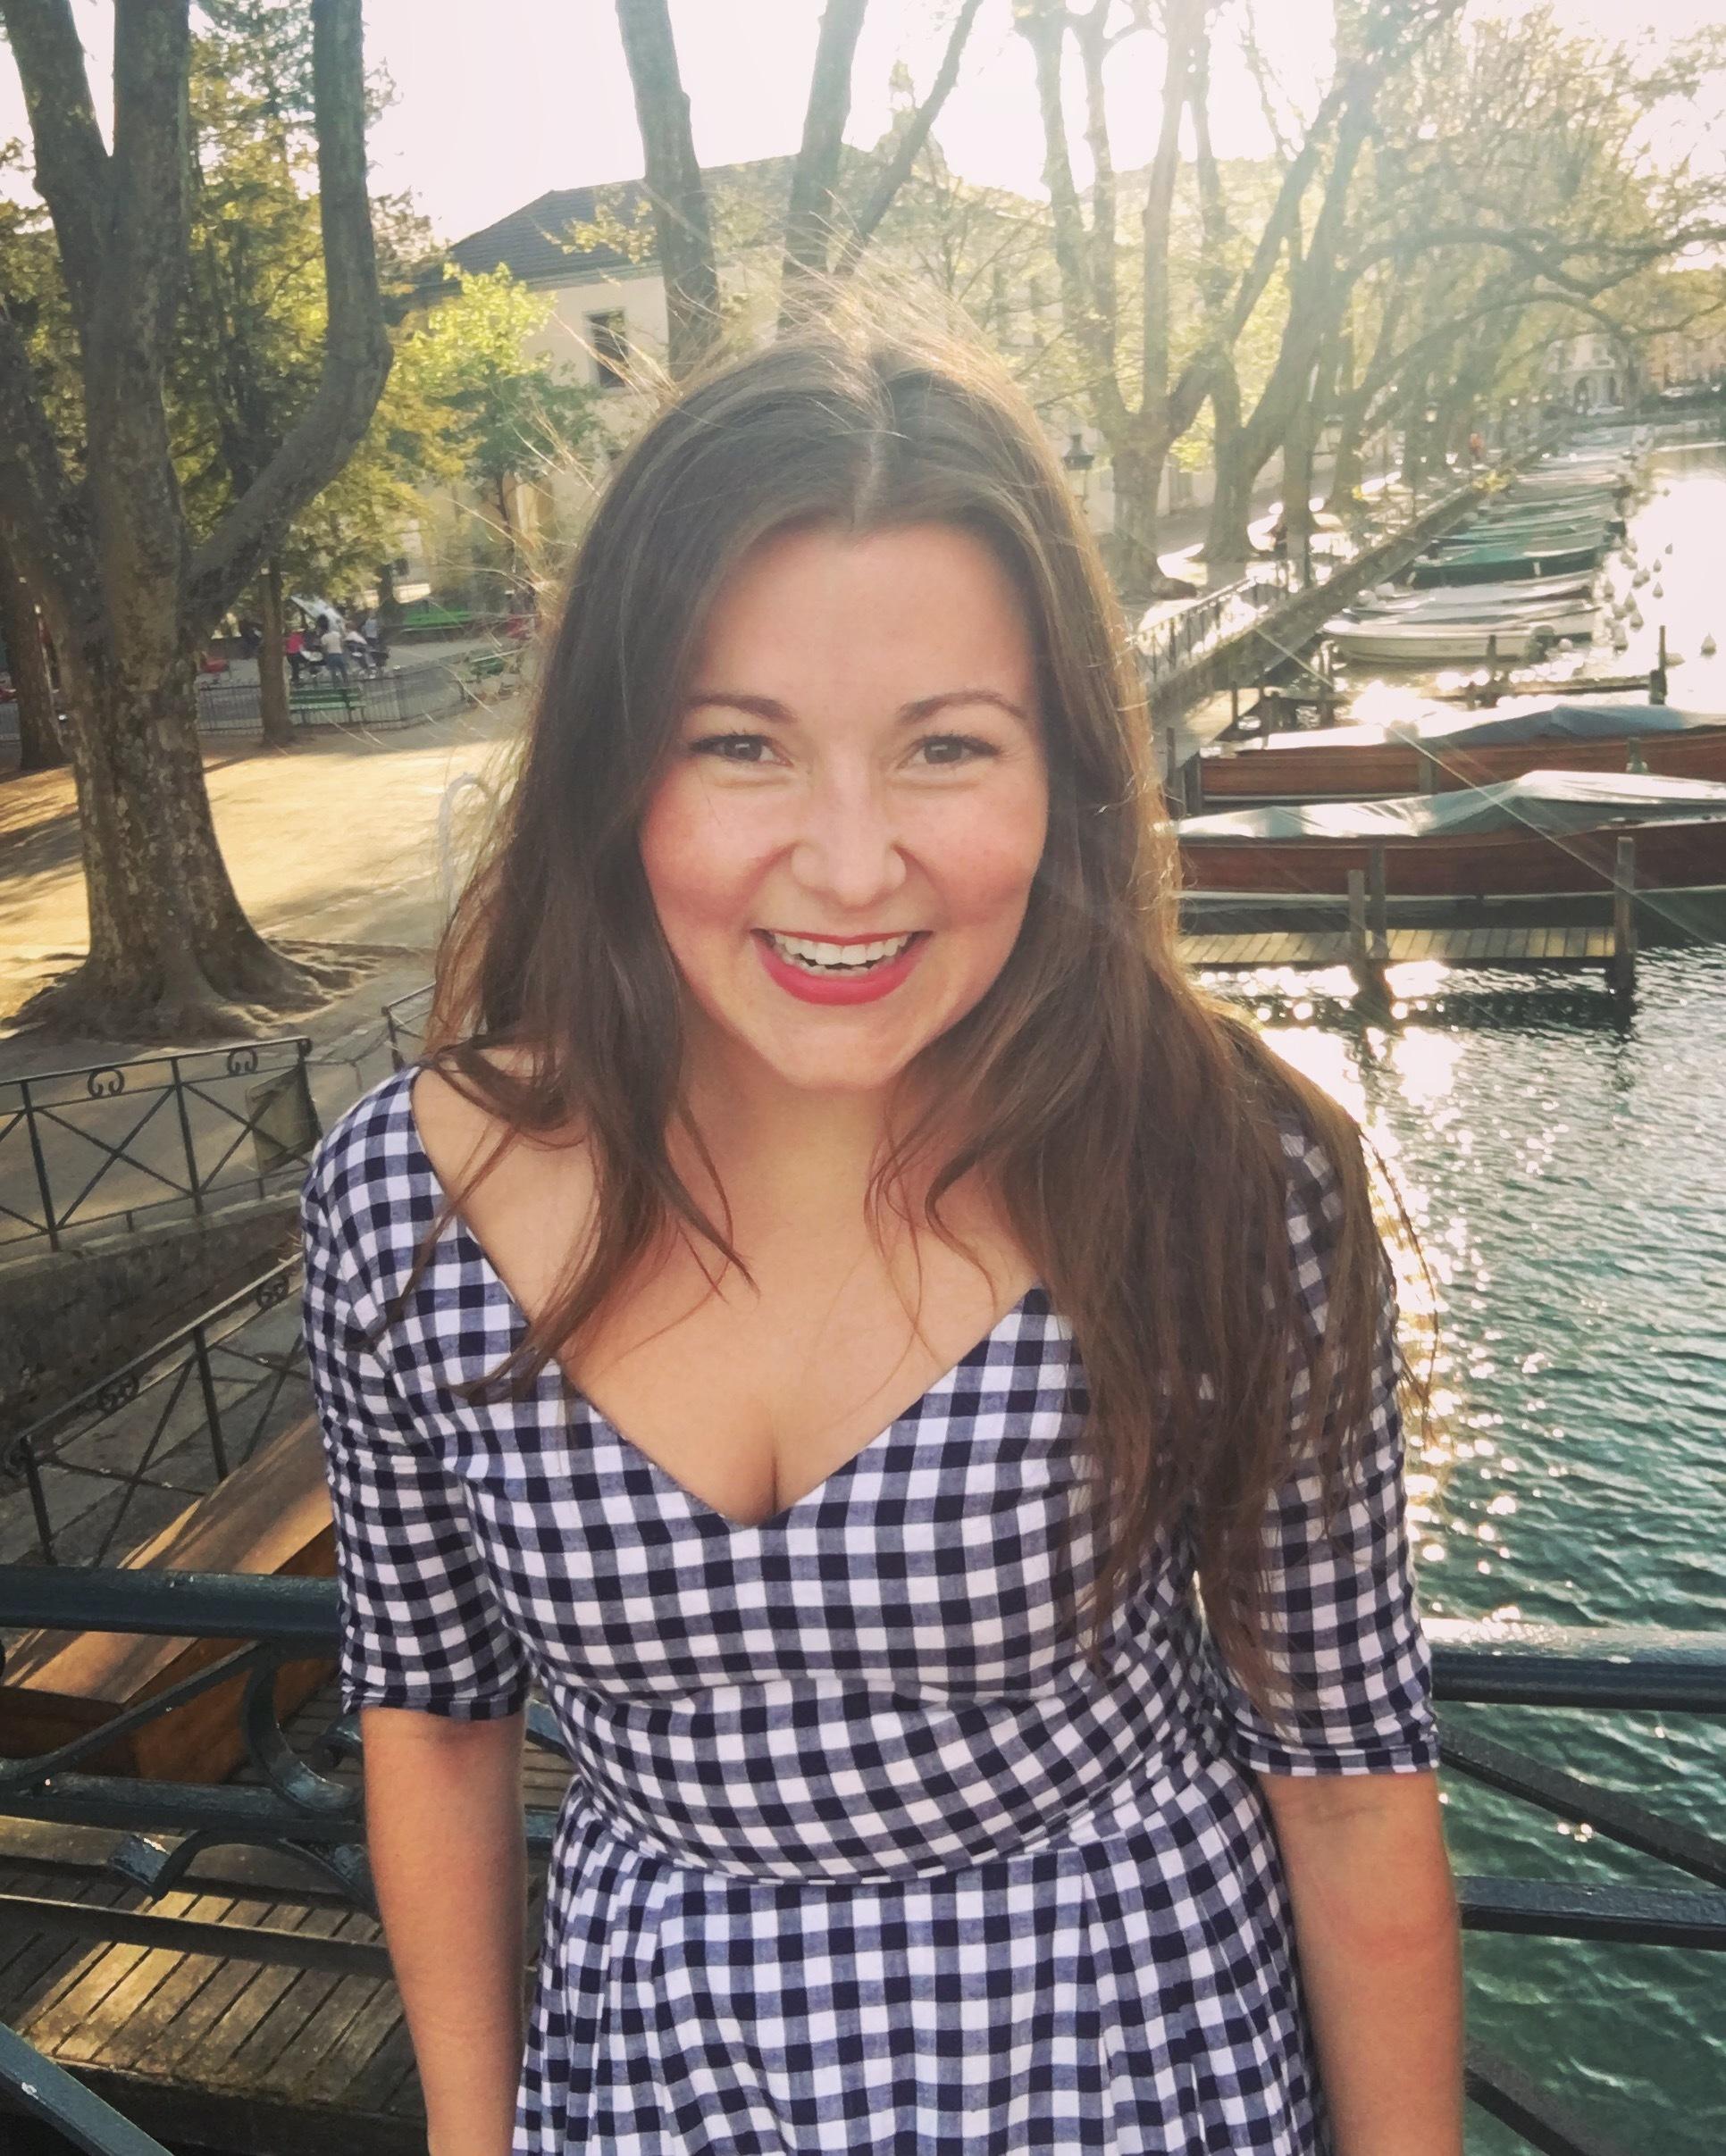 Forum on this topic: Rebecca Welles, jessica-dublin/